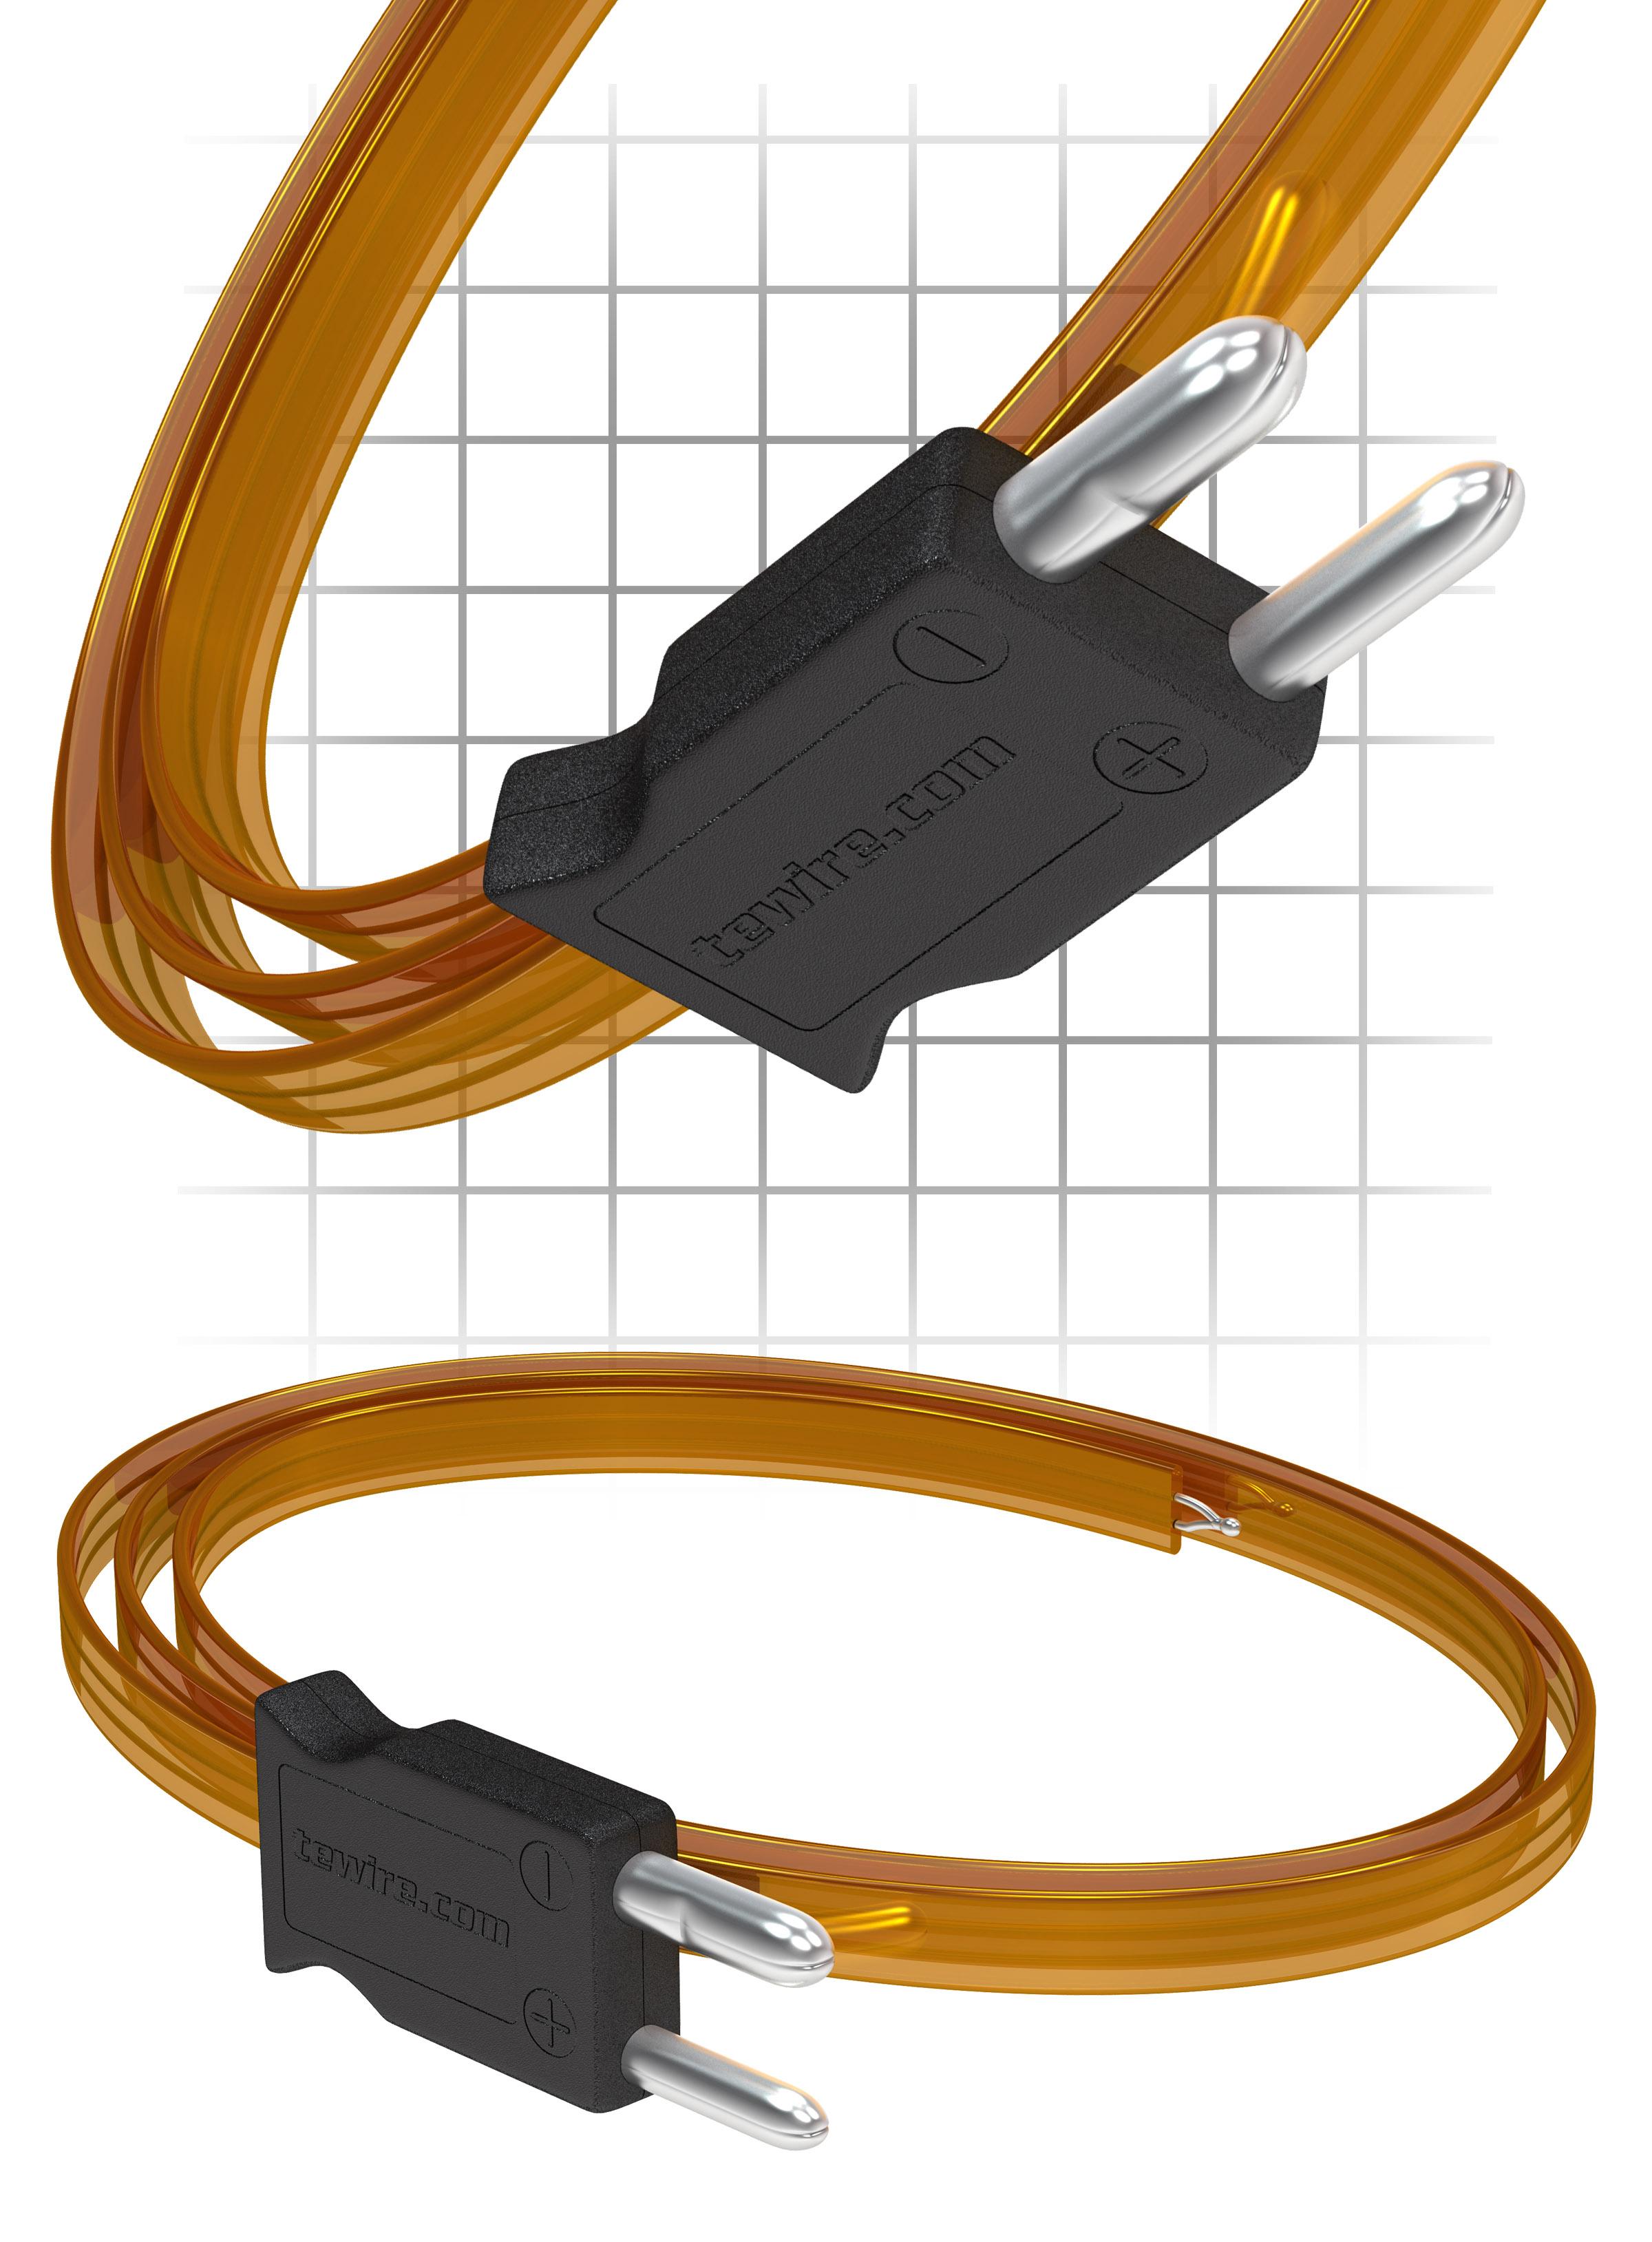 Accuflex Low Profile Thermocouple Cable Assemblies Te